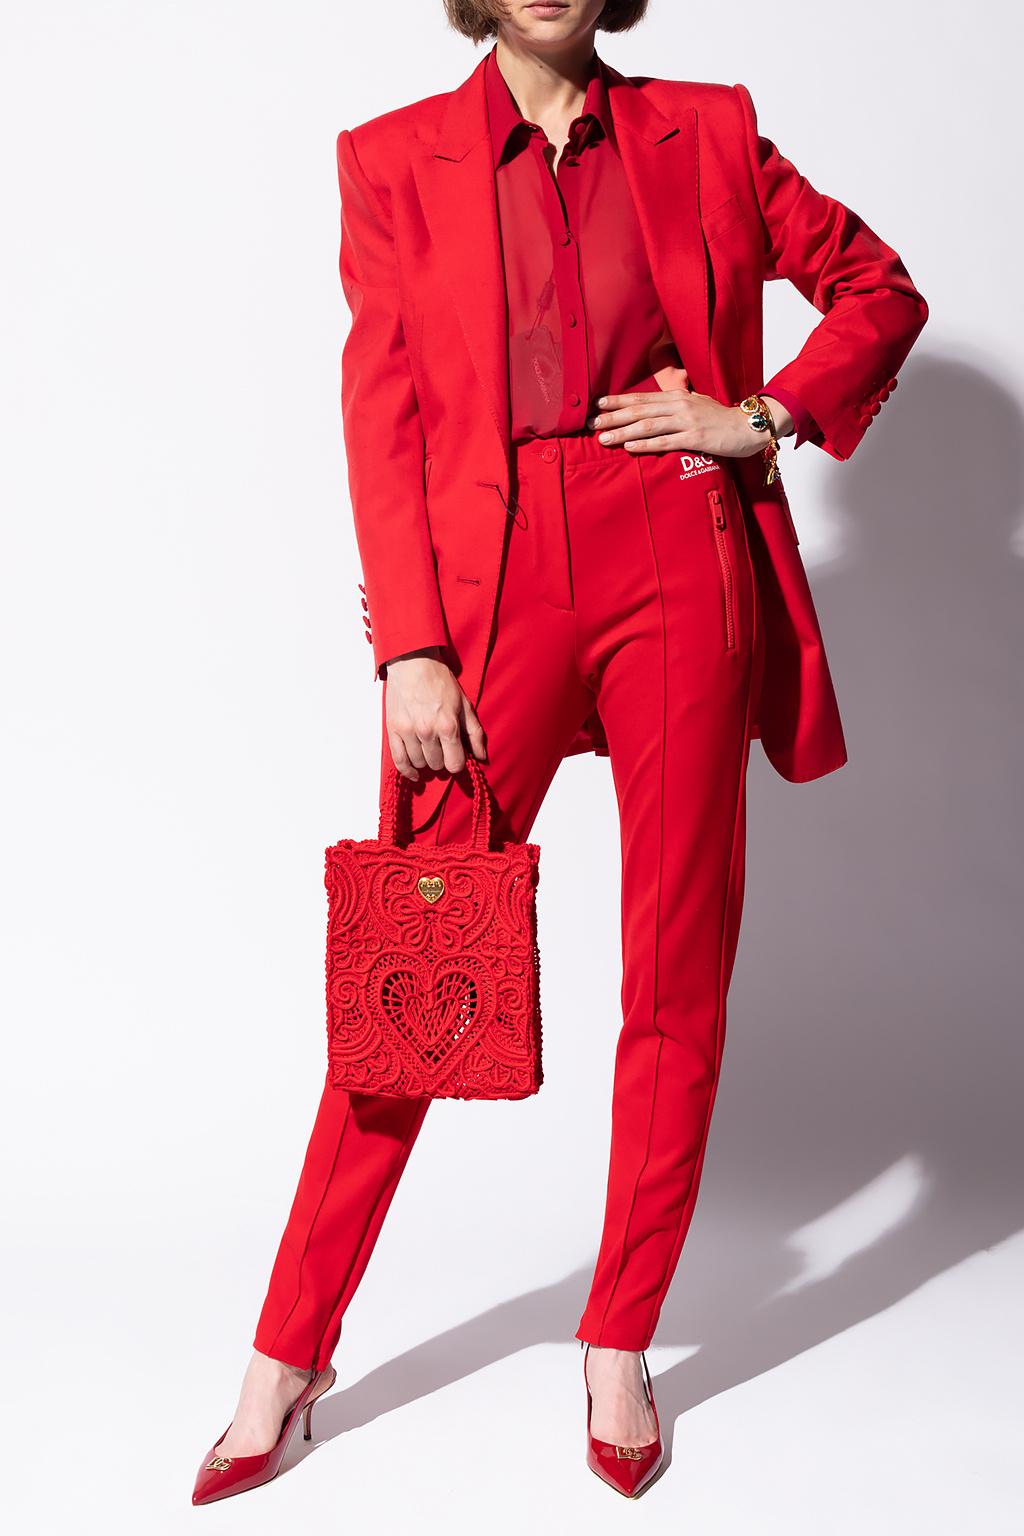 Dolce & Gabbana 丝绸质衬衫